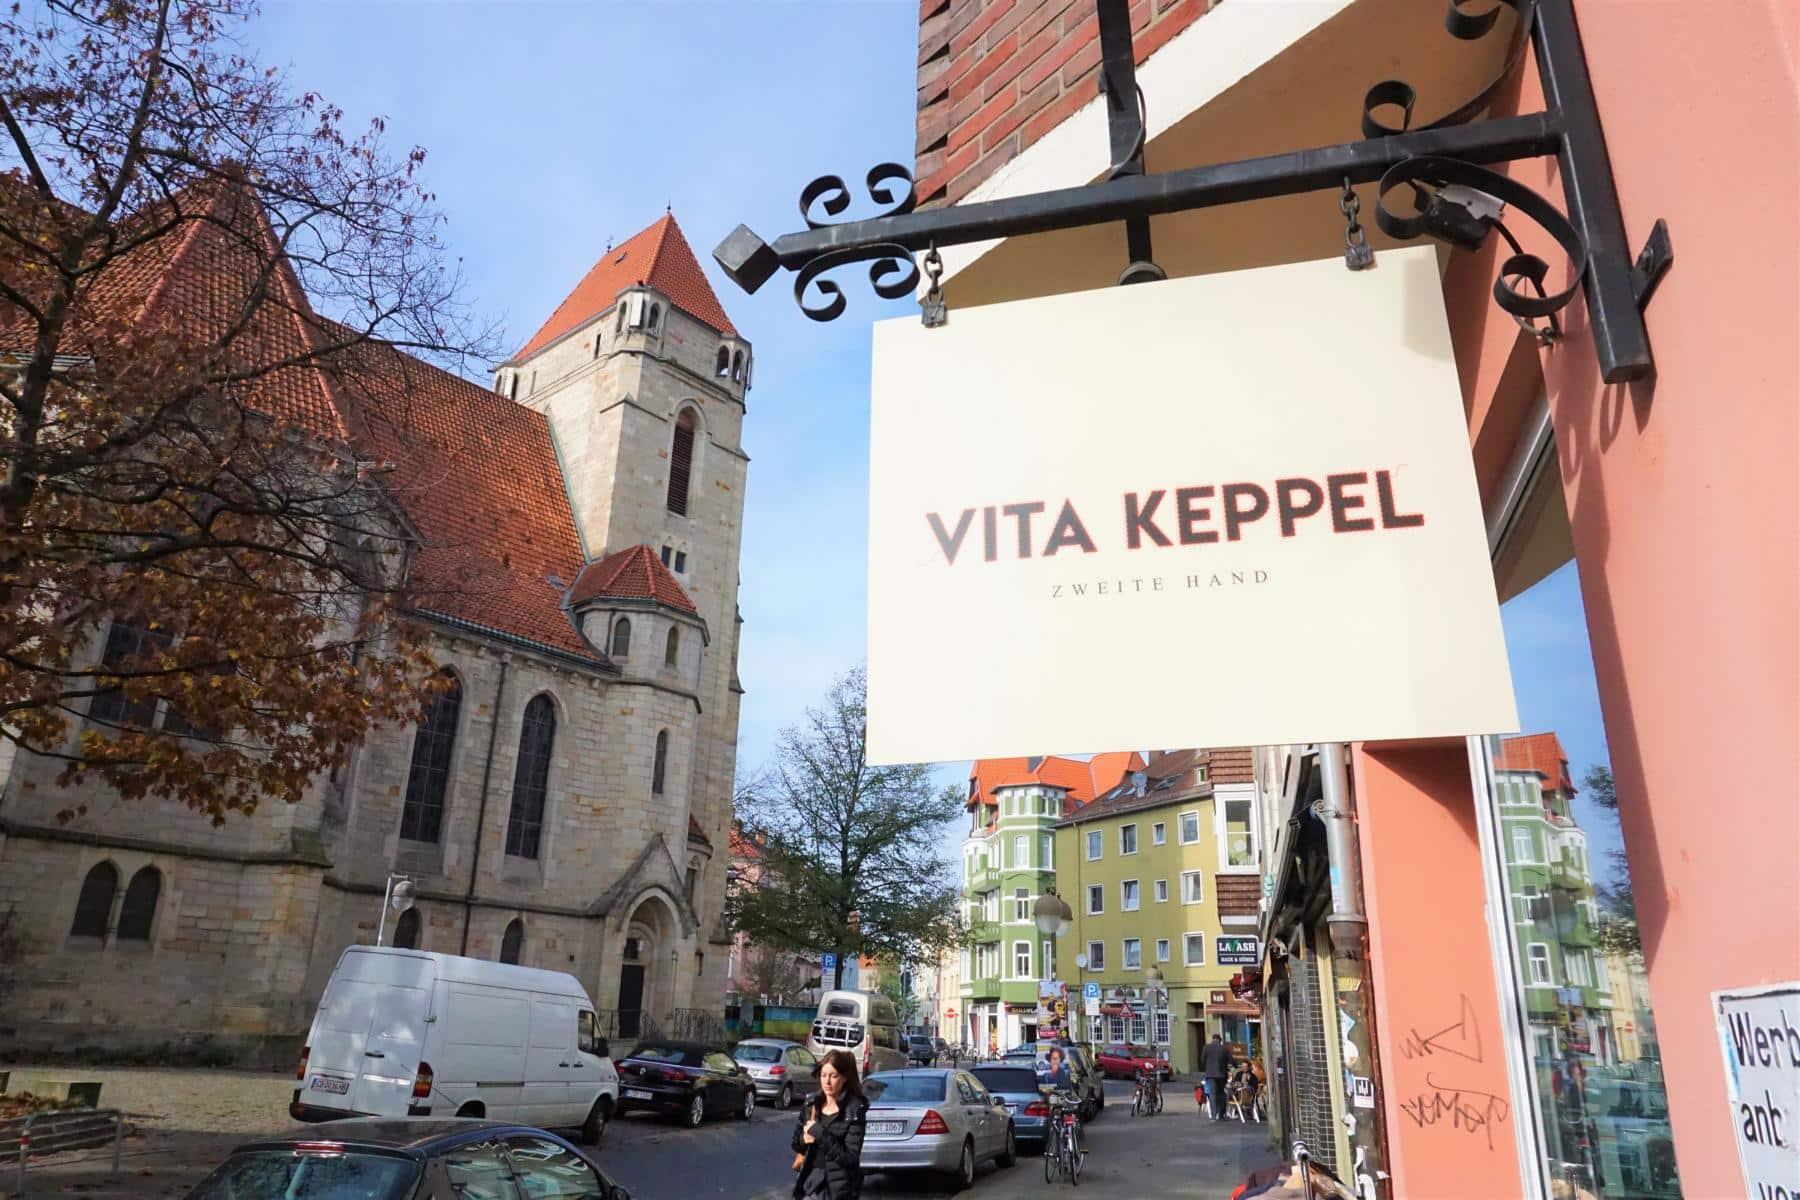 Style Hannover Vita Keppel B - Vita Keppel: Hier können KundInnen kaufen – und verkaufen